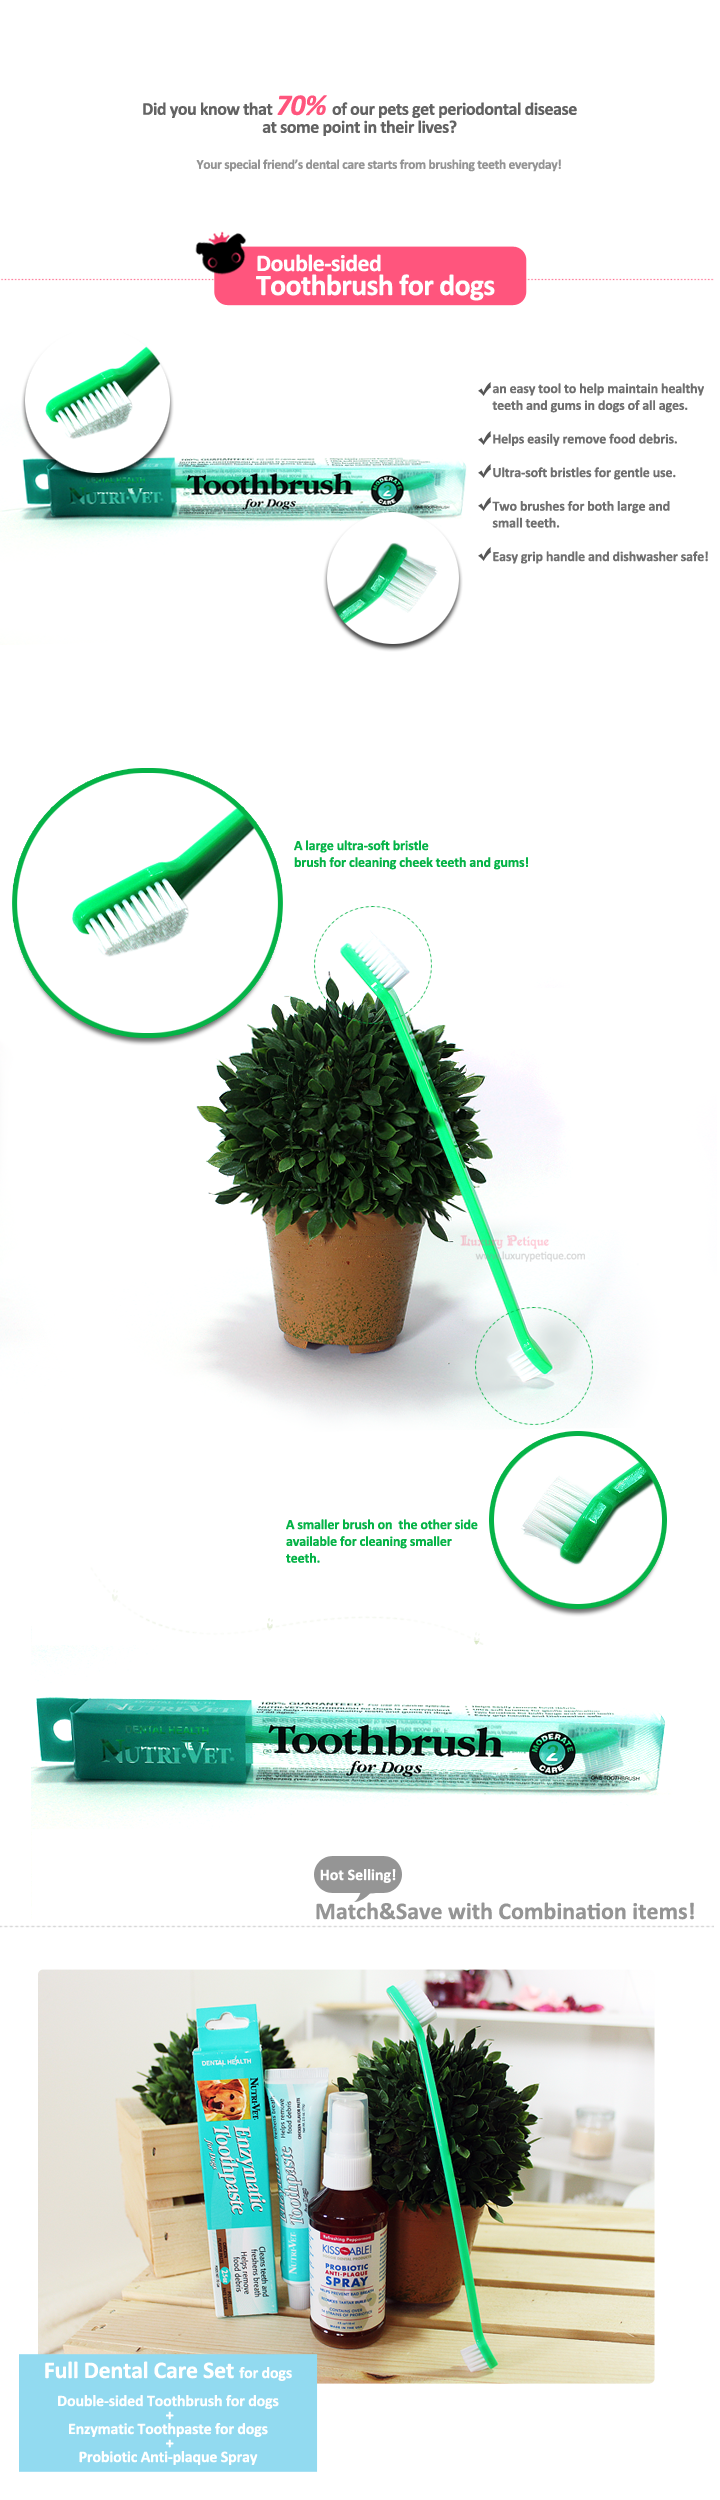 nutrivet-toothbrush.png